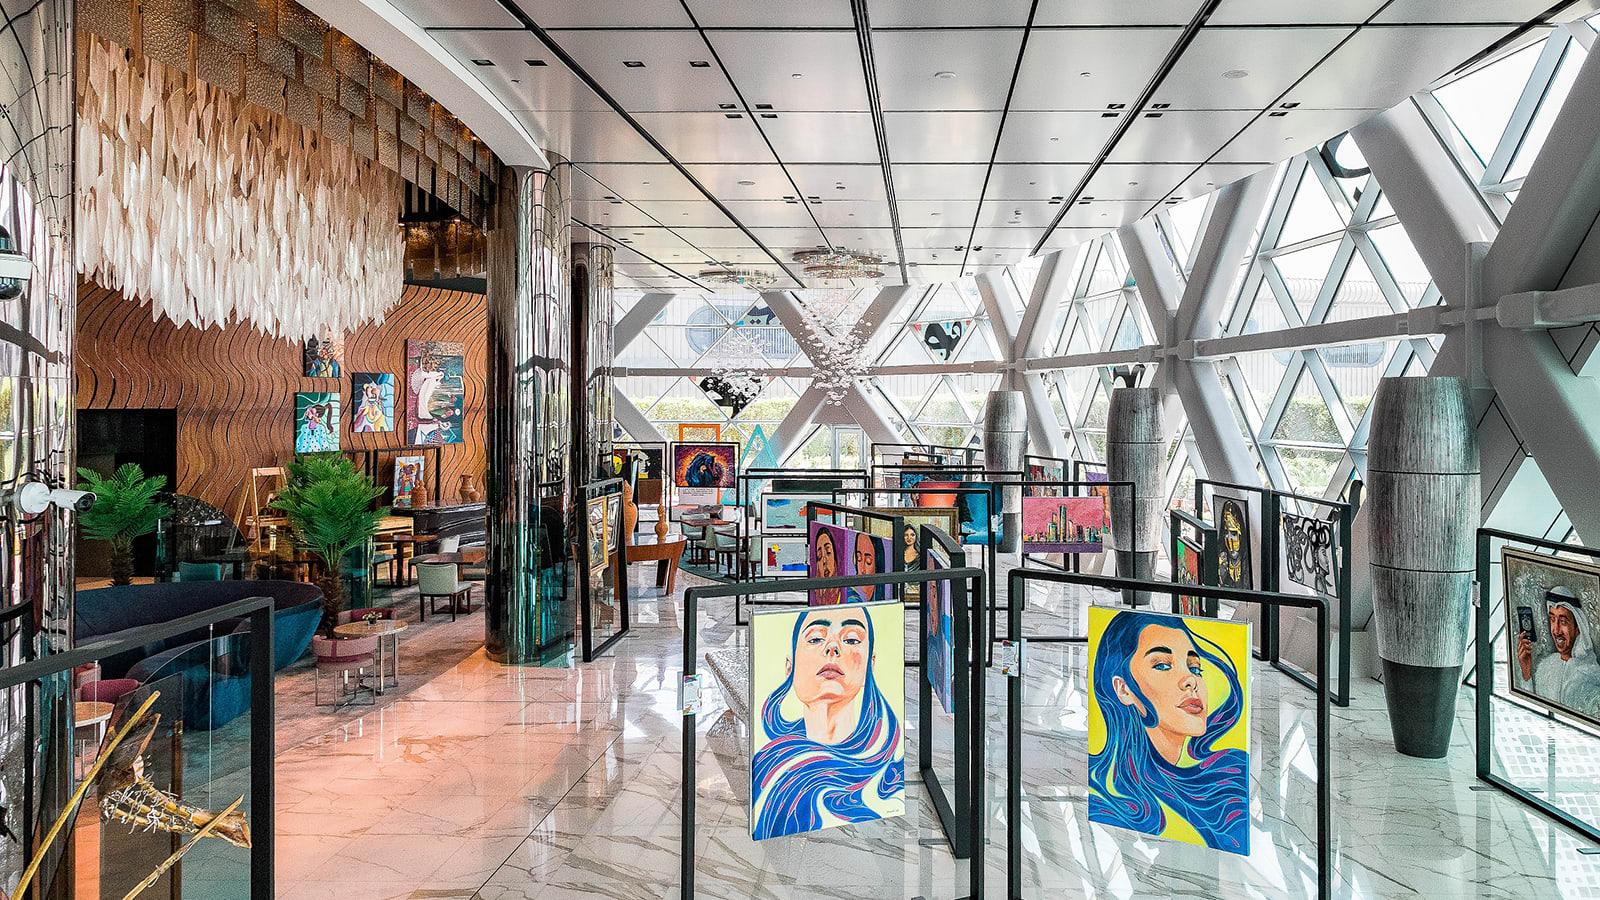 The Andaz puts Emirati art center stage